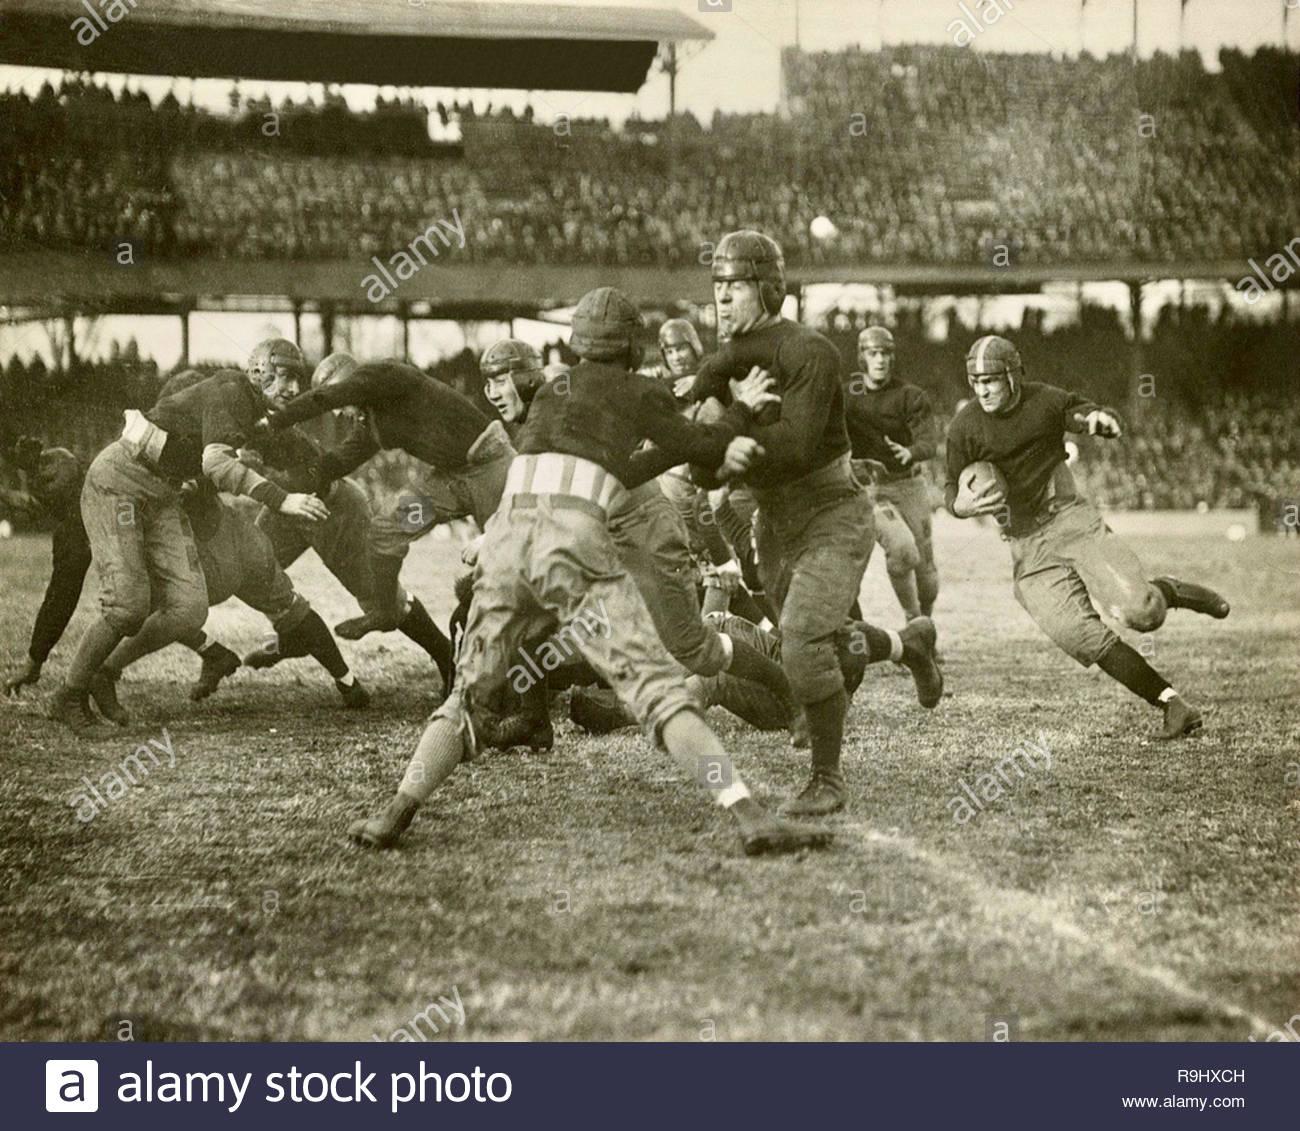 Football game between 1920 & 1930 - Stock Image